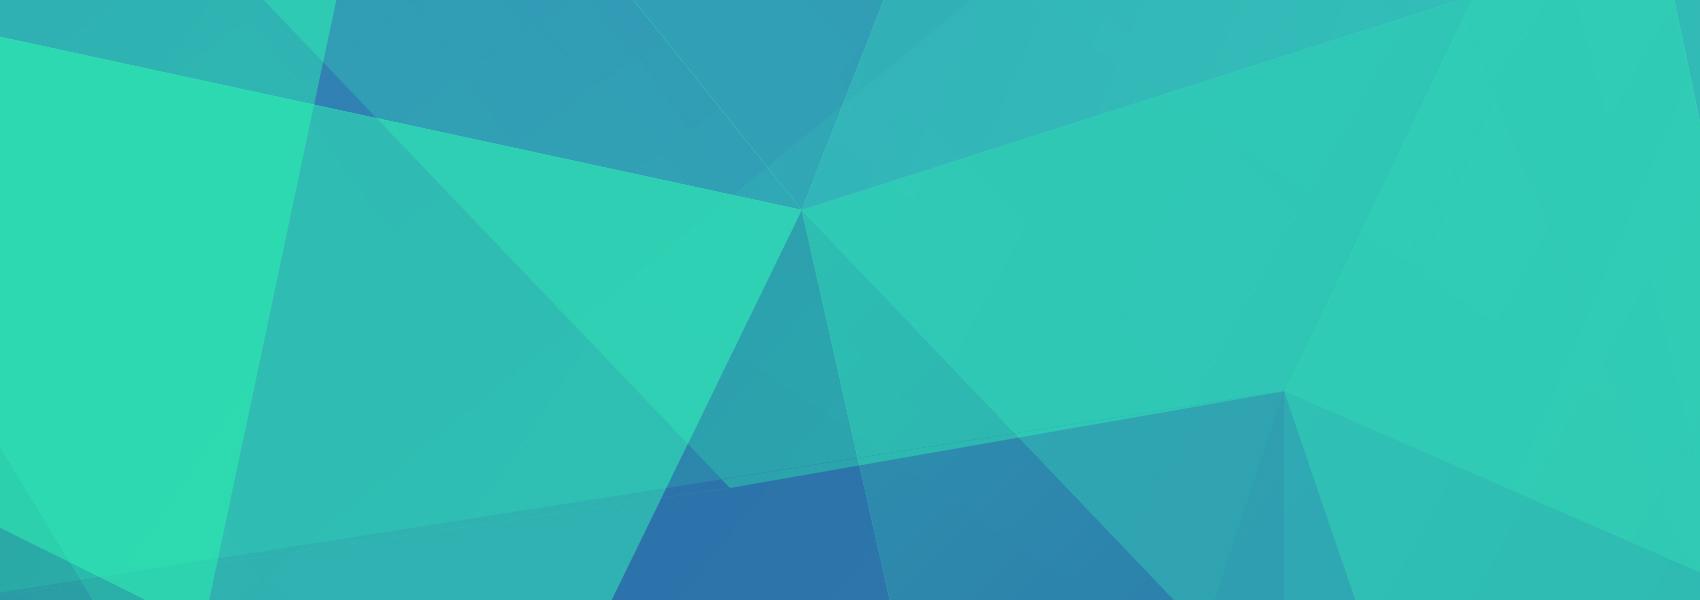 Background_Green